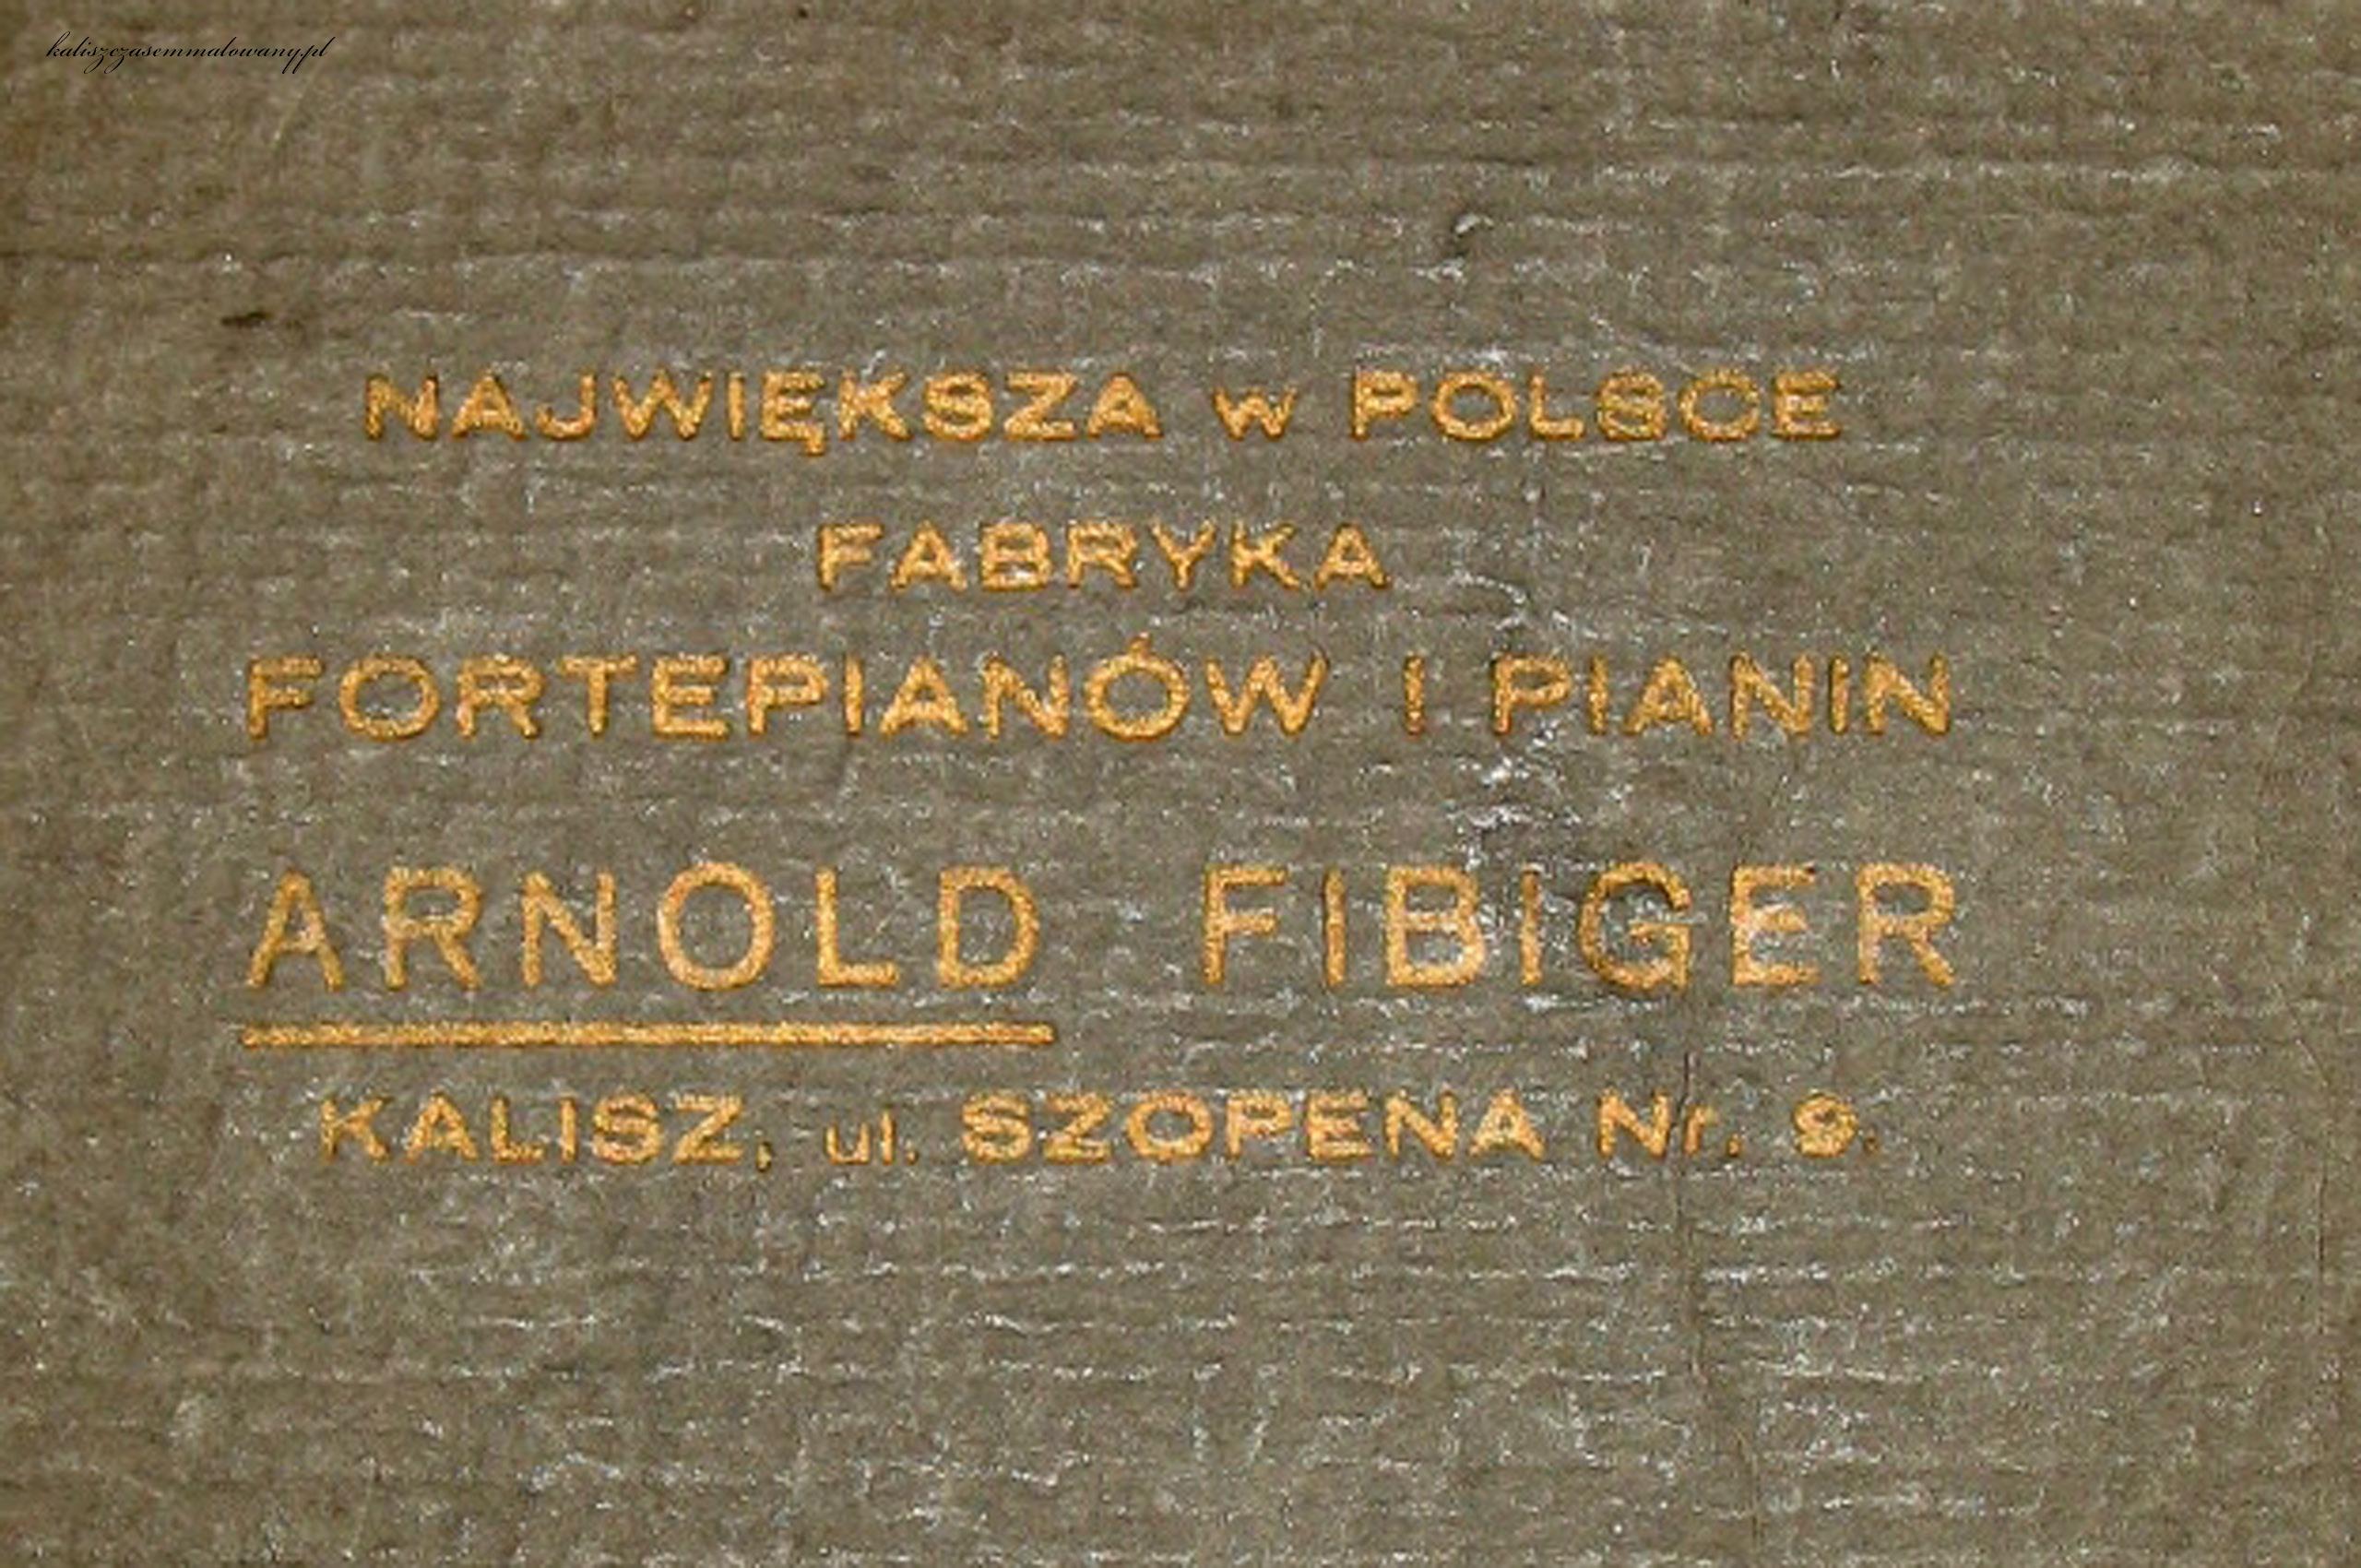 Fibiger-14